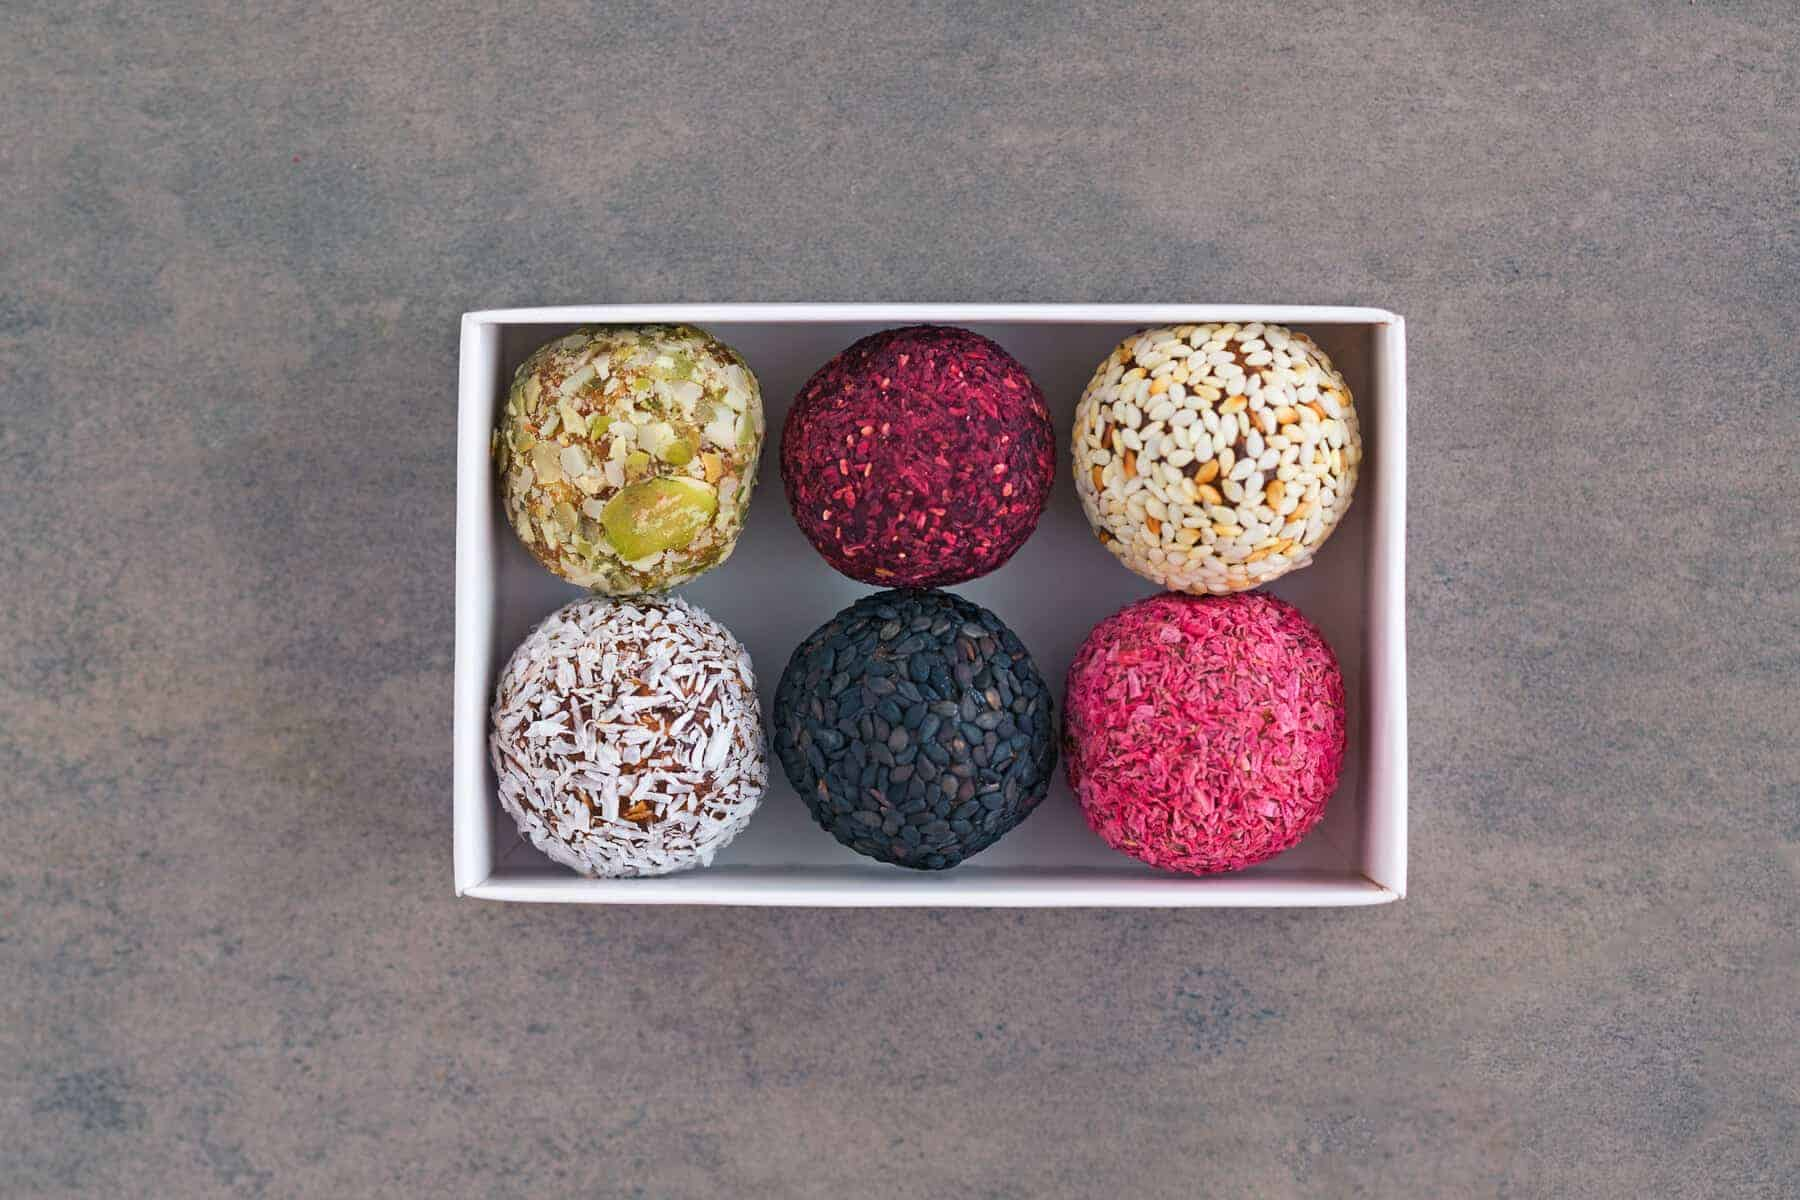 Selbst gemachte Energy Balls –Foto: Shutterstock.com/July Prokopiv